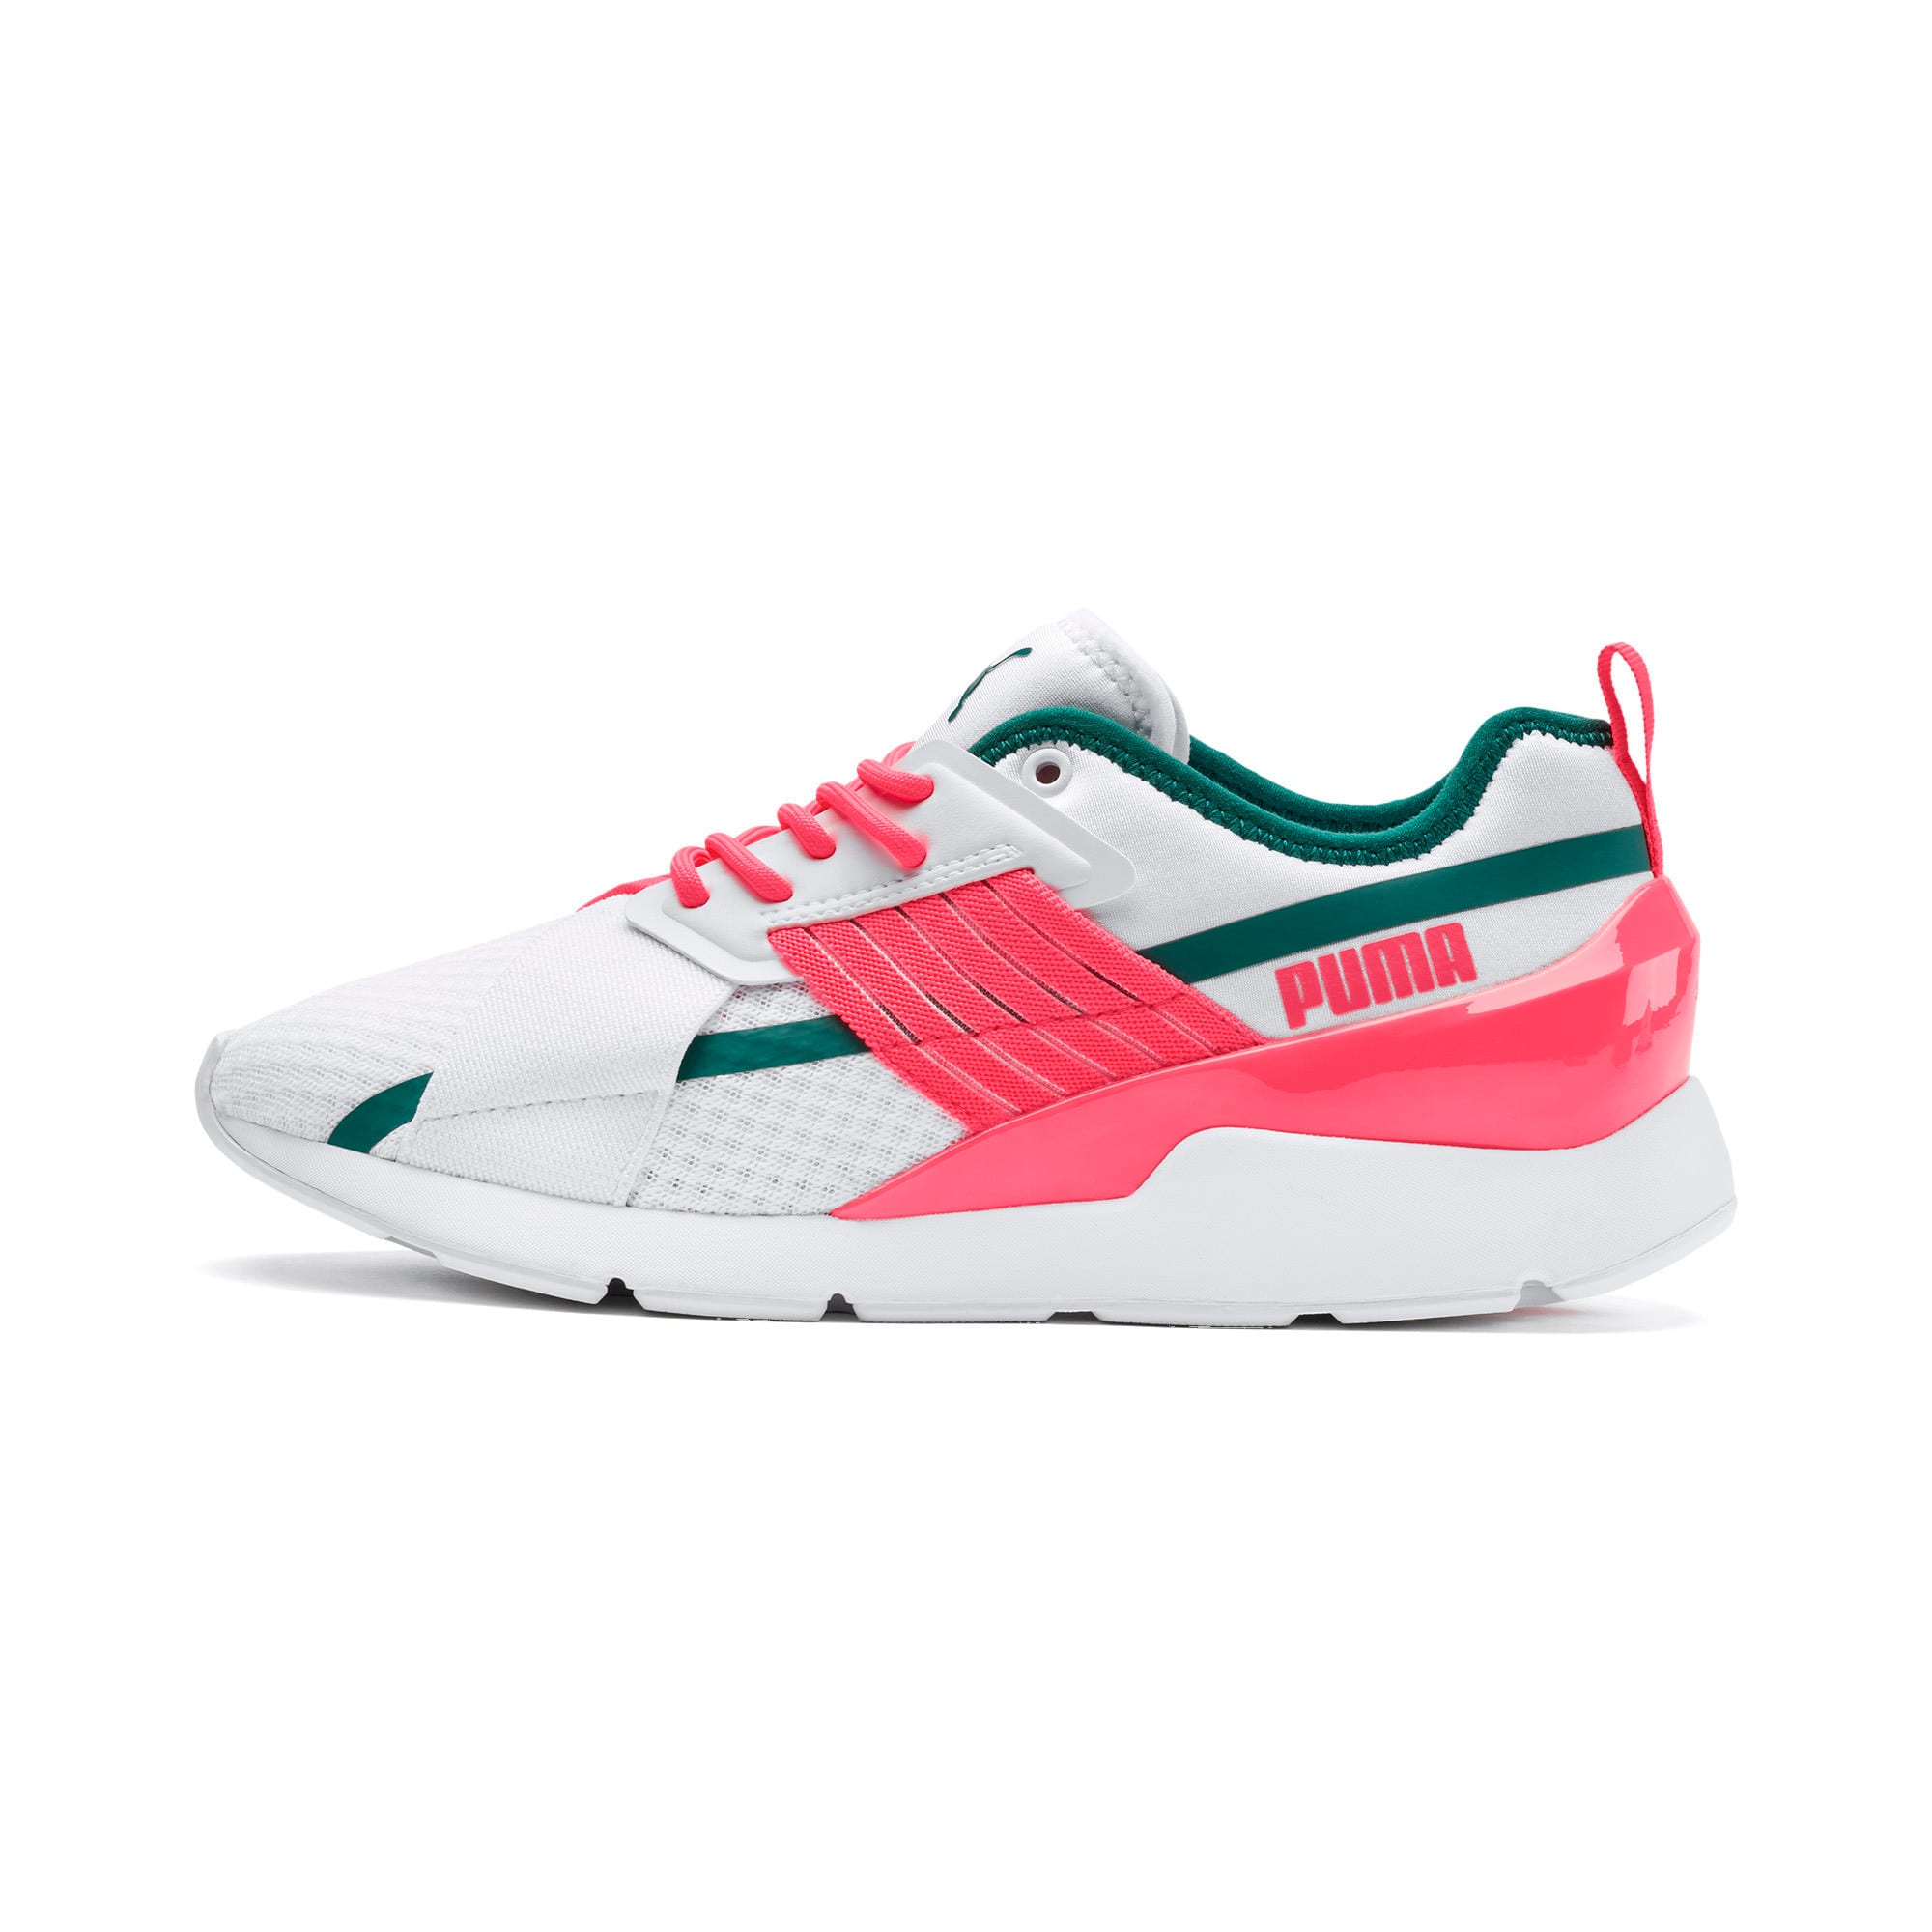 Thumbnail 1 of Muse X-2 Women's Sneakers, Puma White-Pink Alert, medium